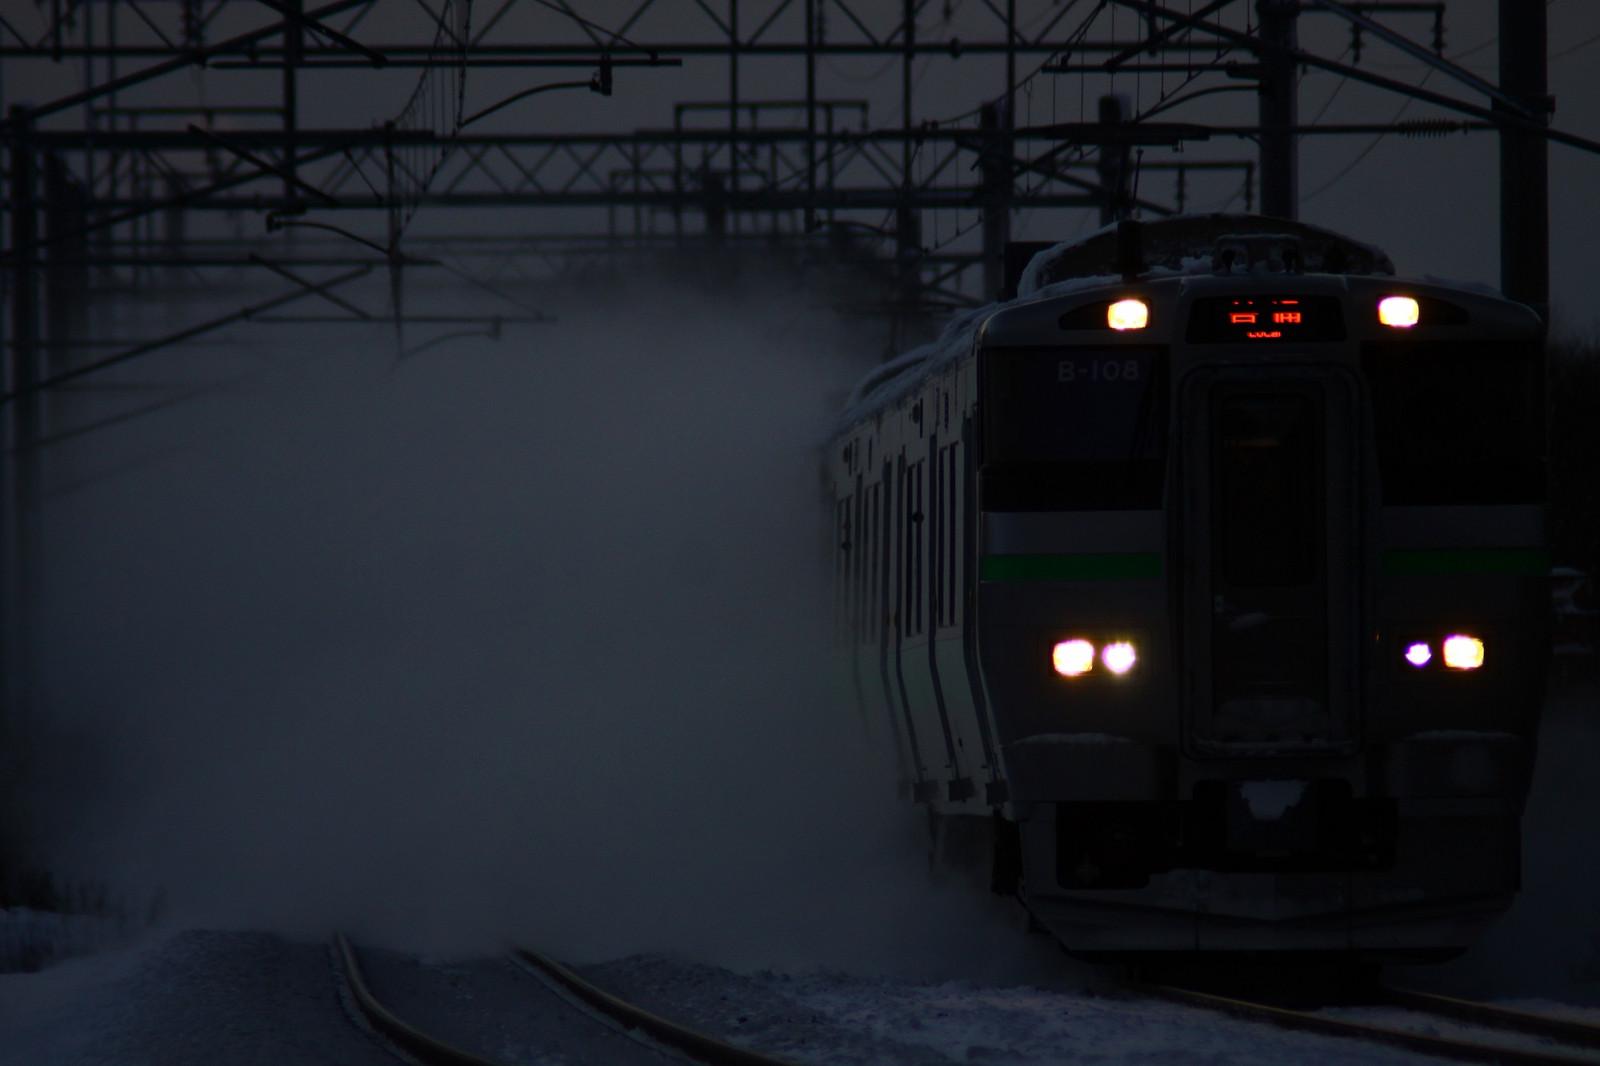 Jr1512193000